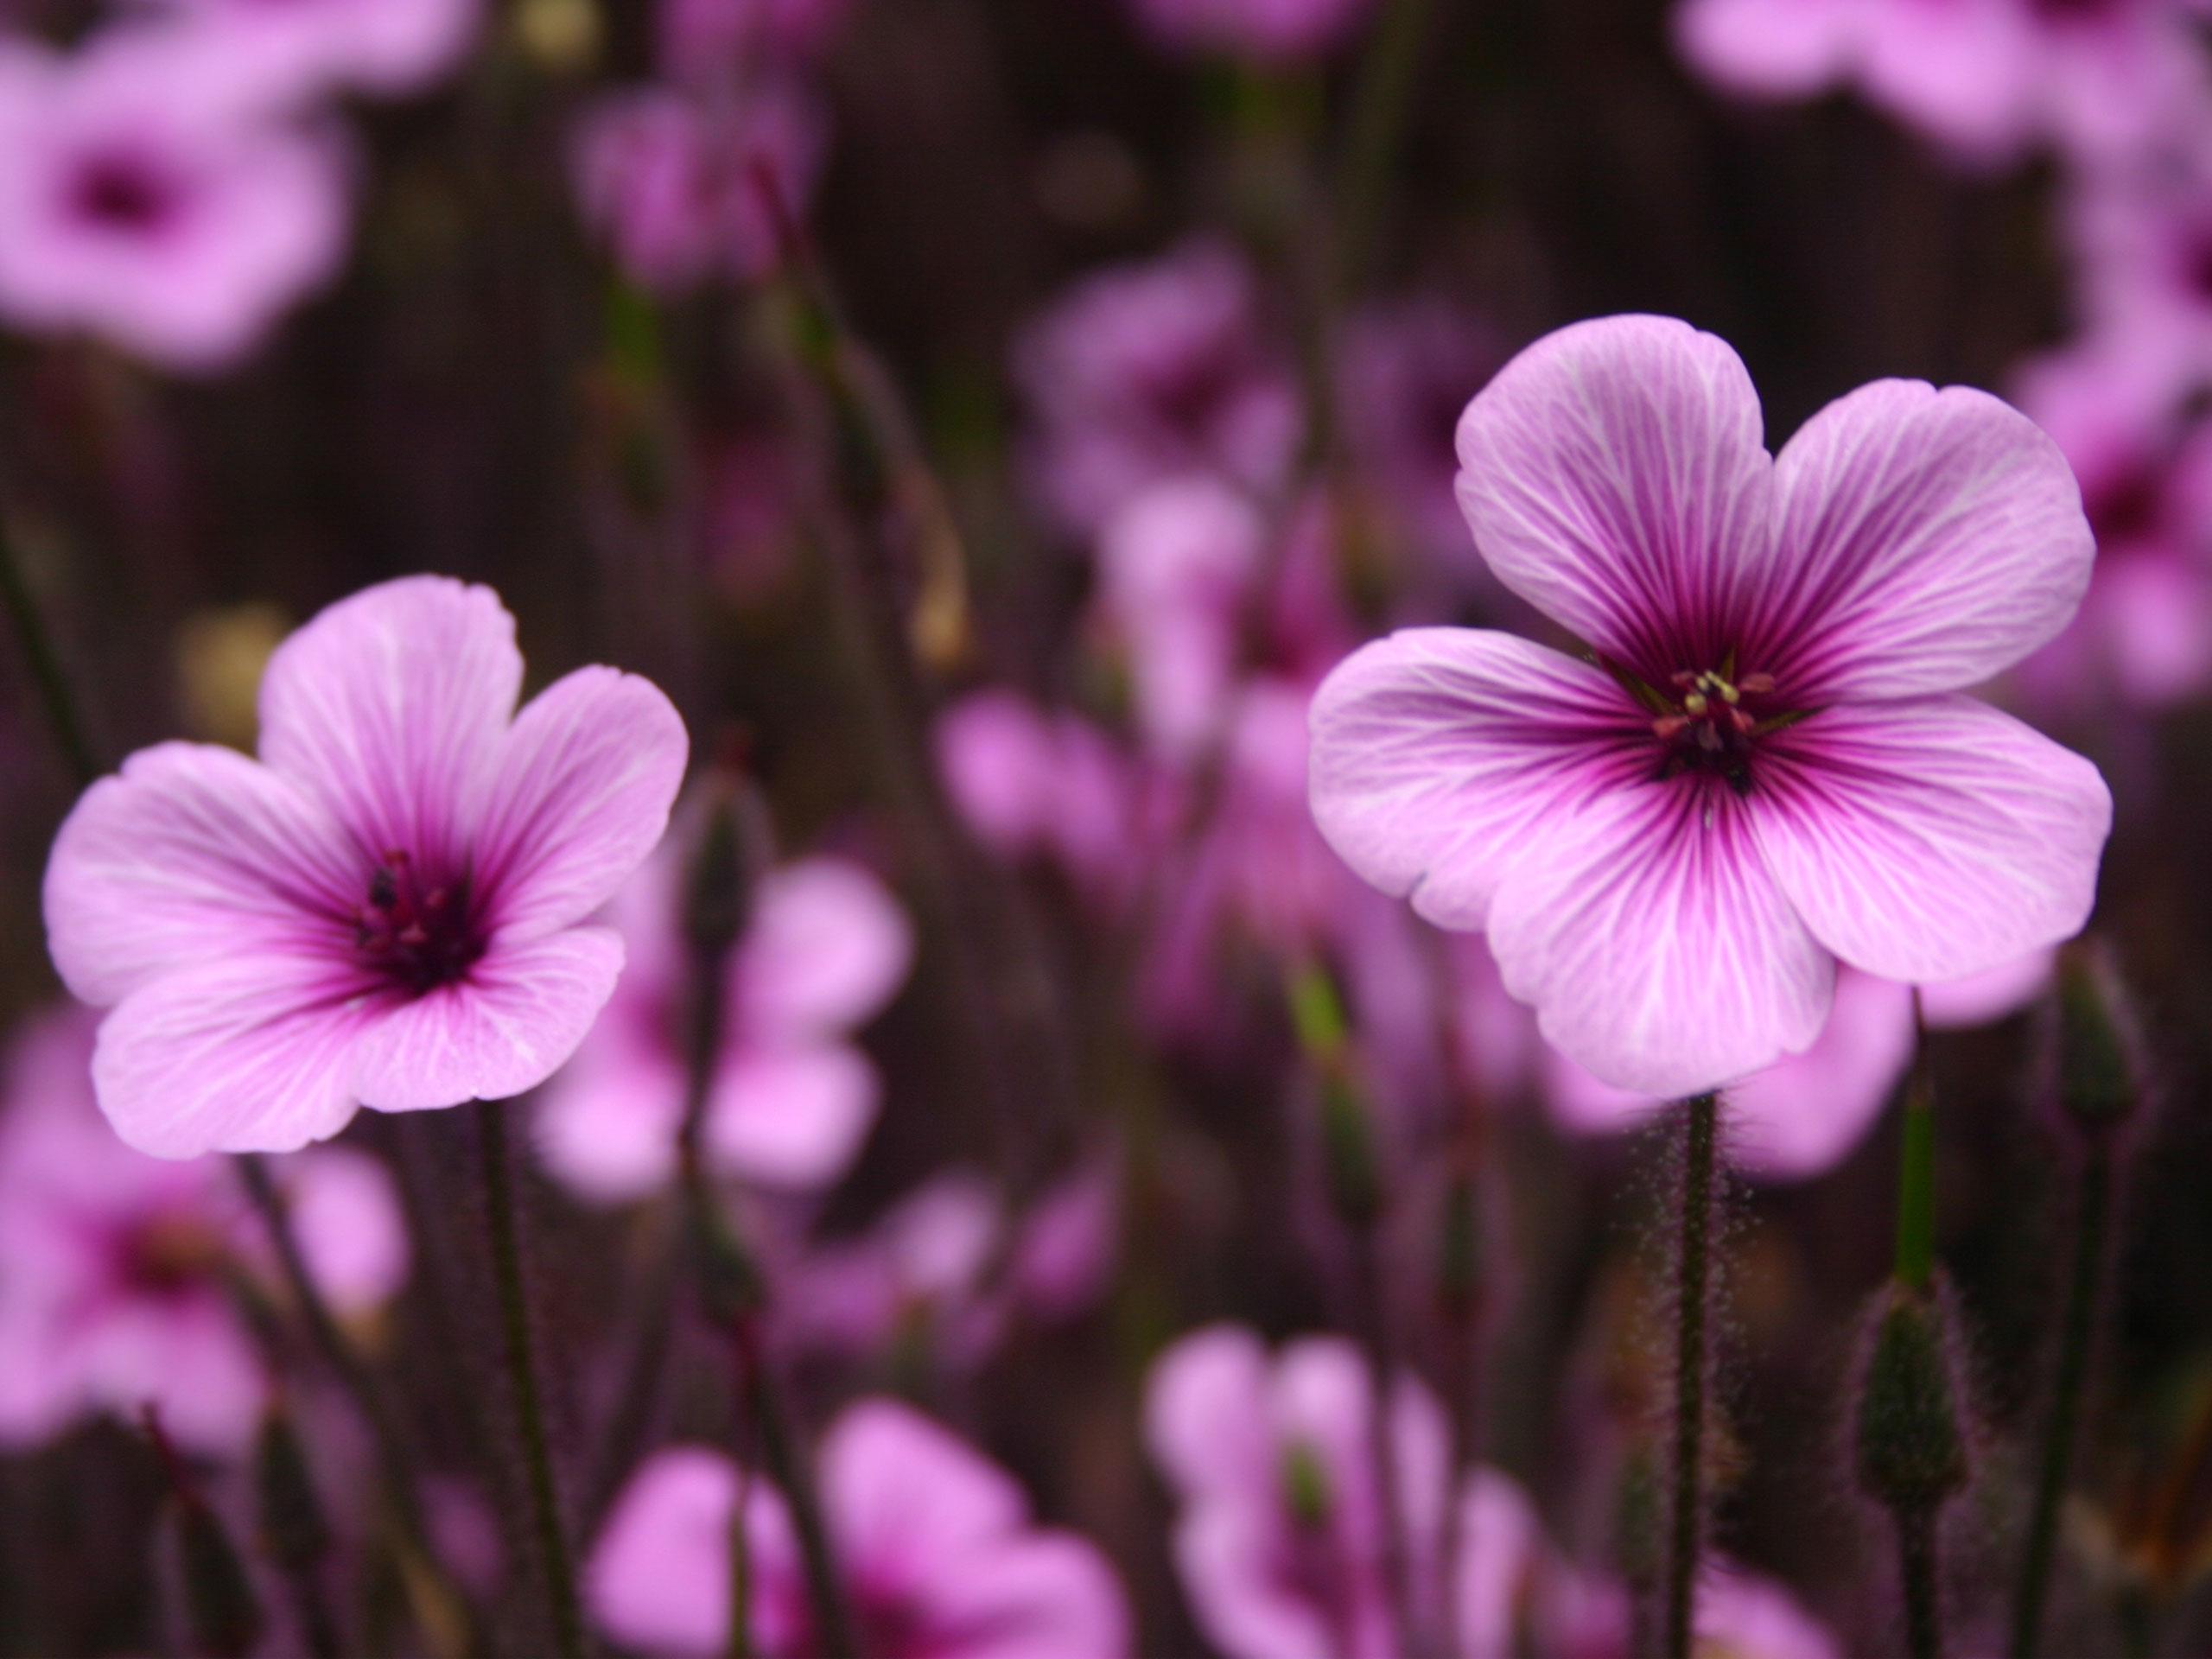 purple flower wallpaper images  wallpapersafari, Beautiful flower